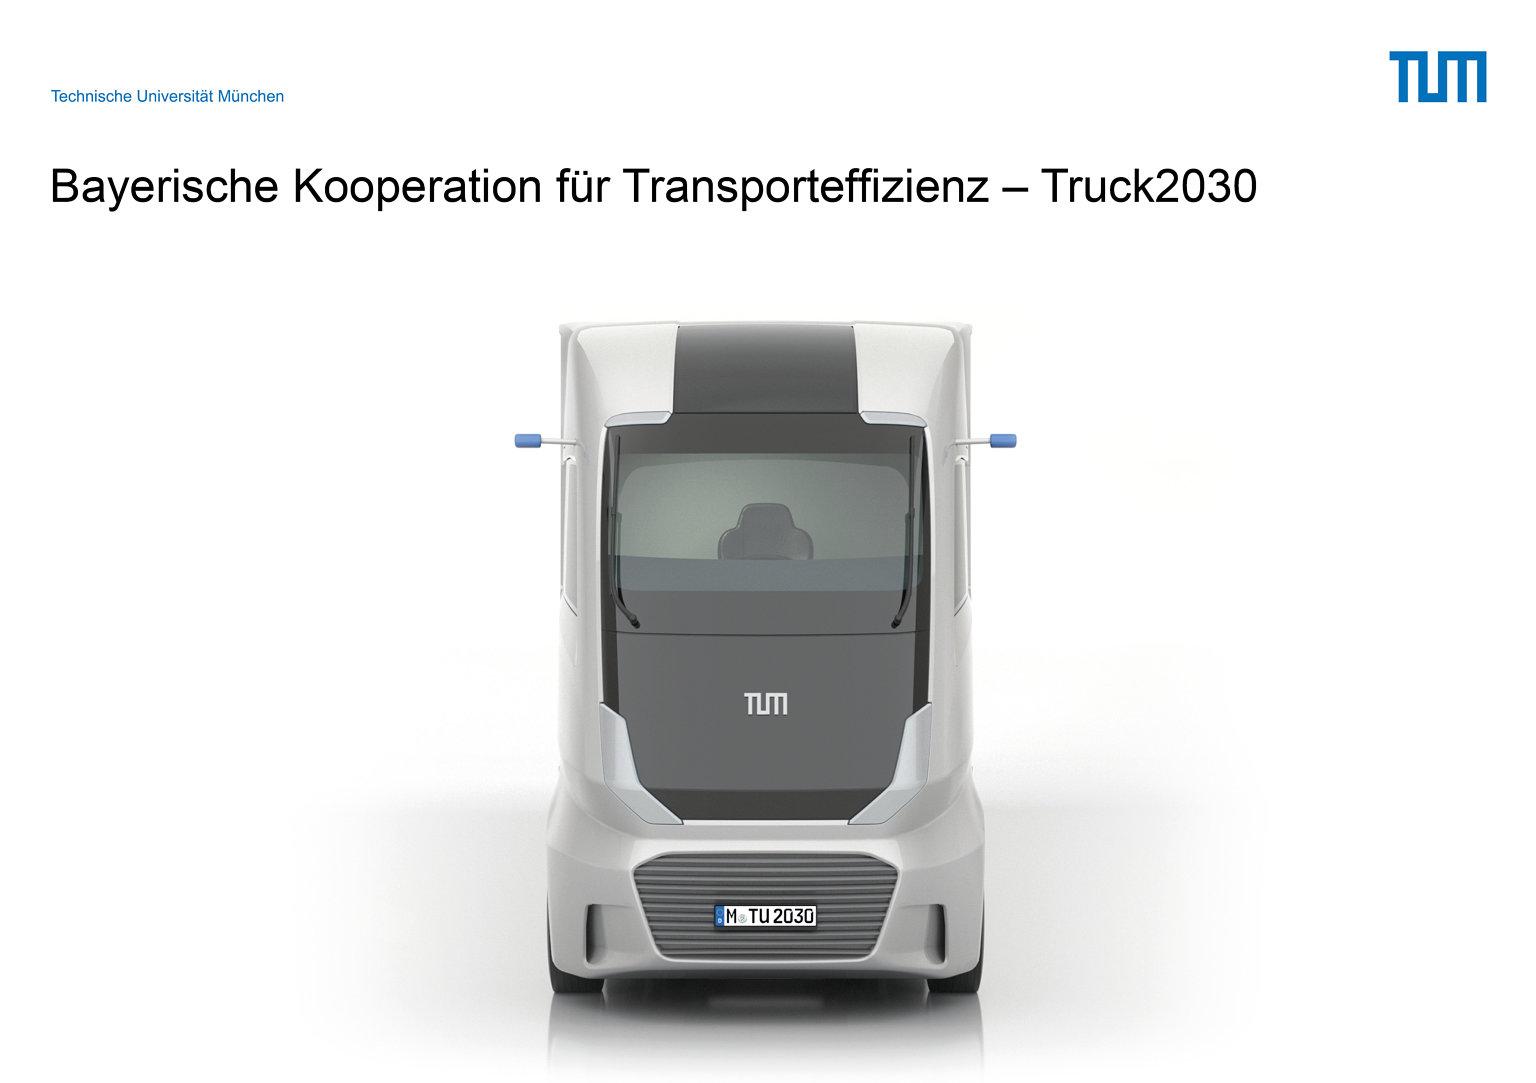 Truck 2030 Broschüre